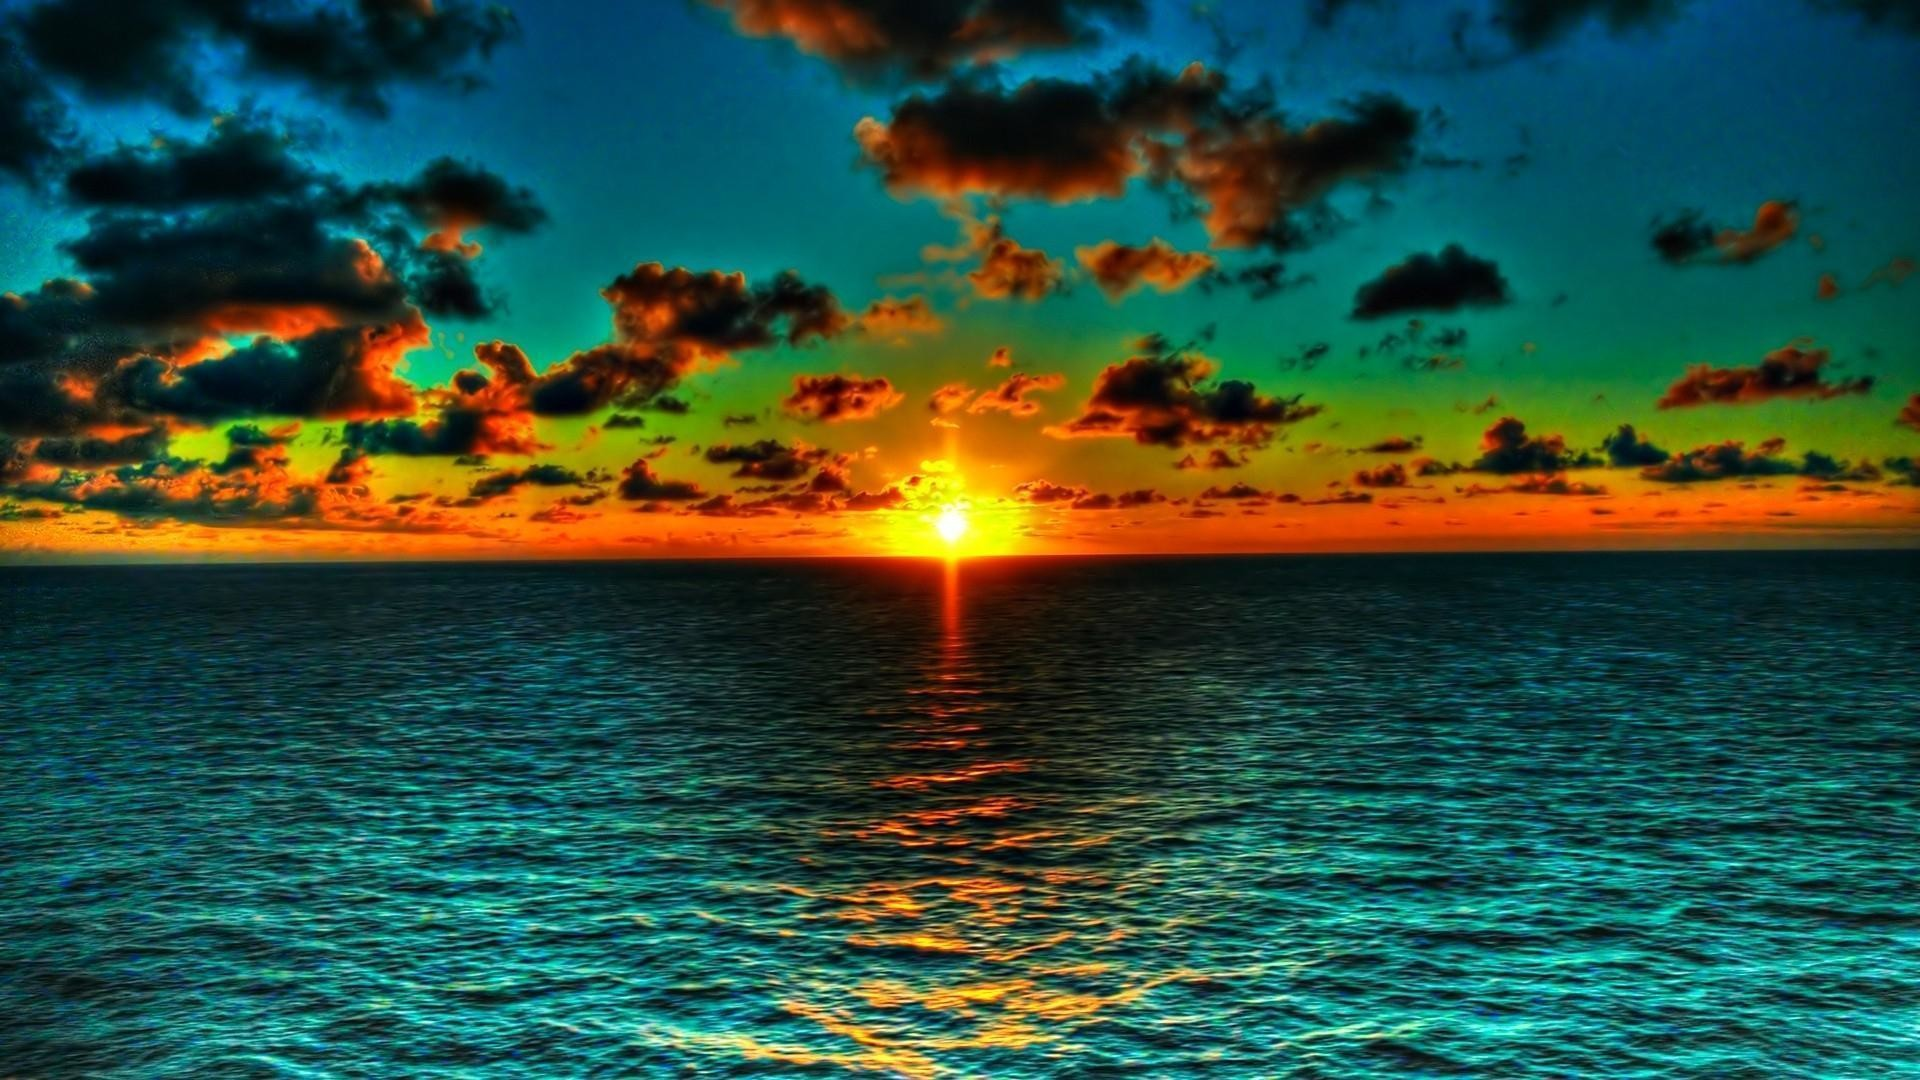 Free Wallpaper Ocean Sunset Pictures 5 HD Wallpapers   Eakai.